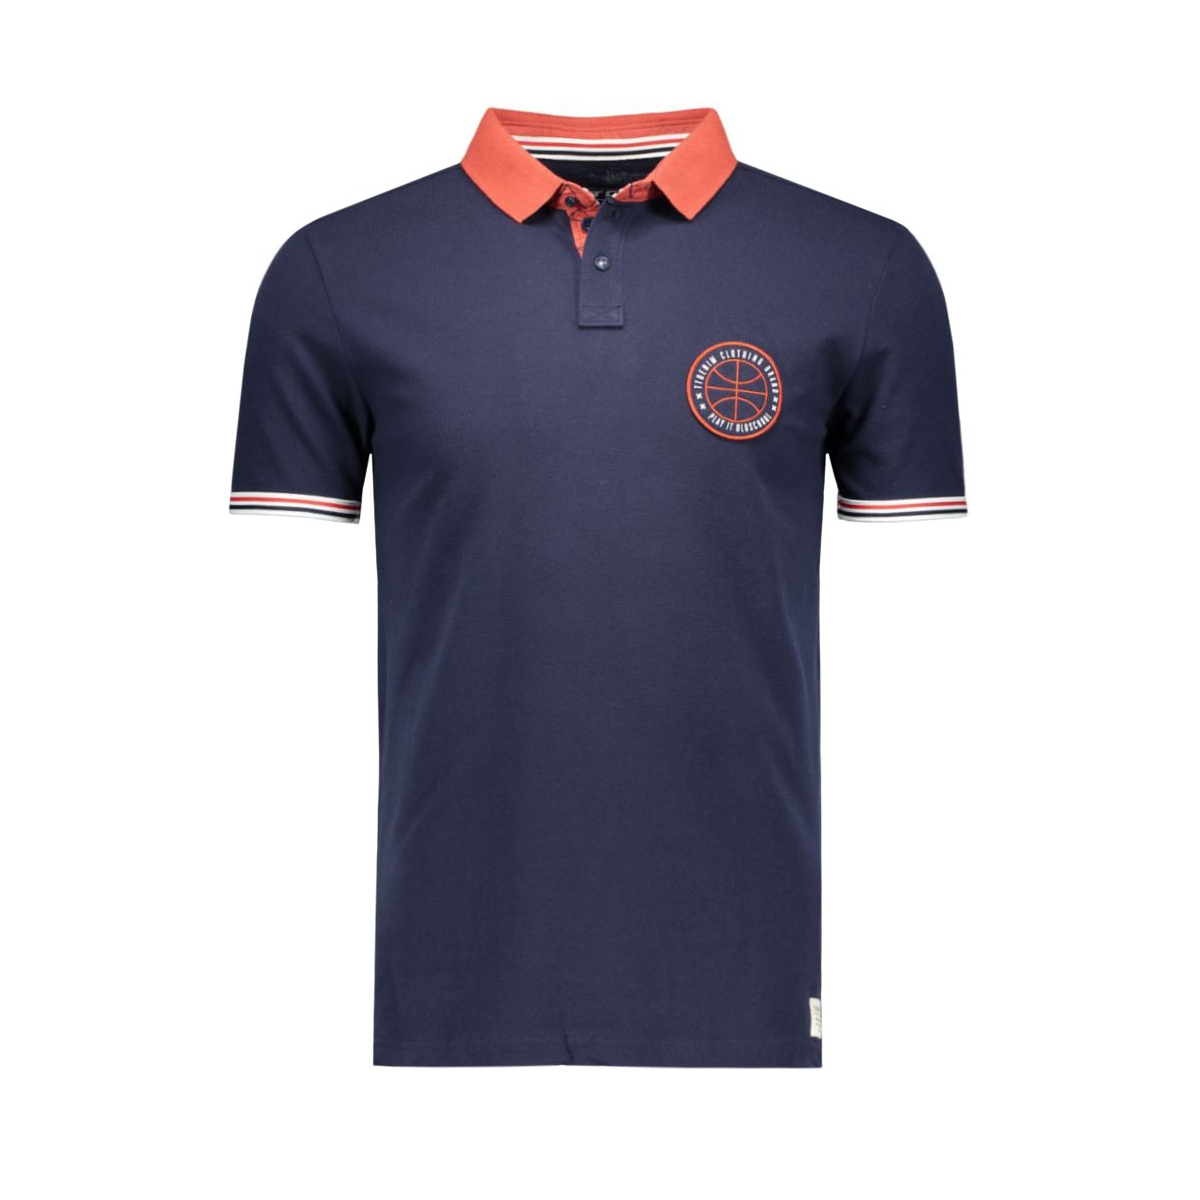 1530982.00.12 tom tailor polo 6576